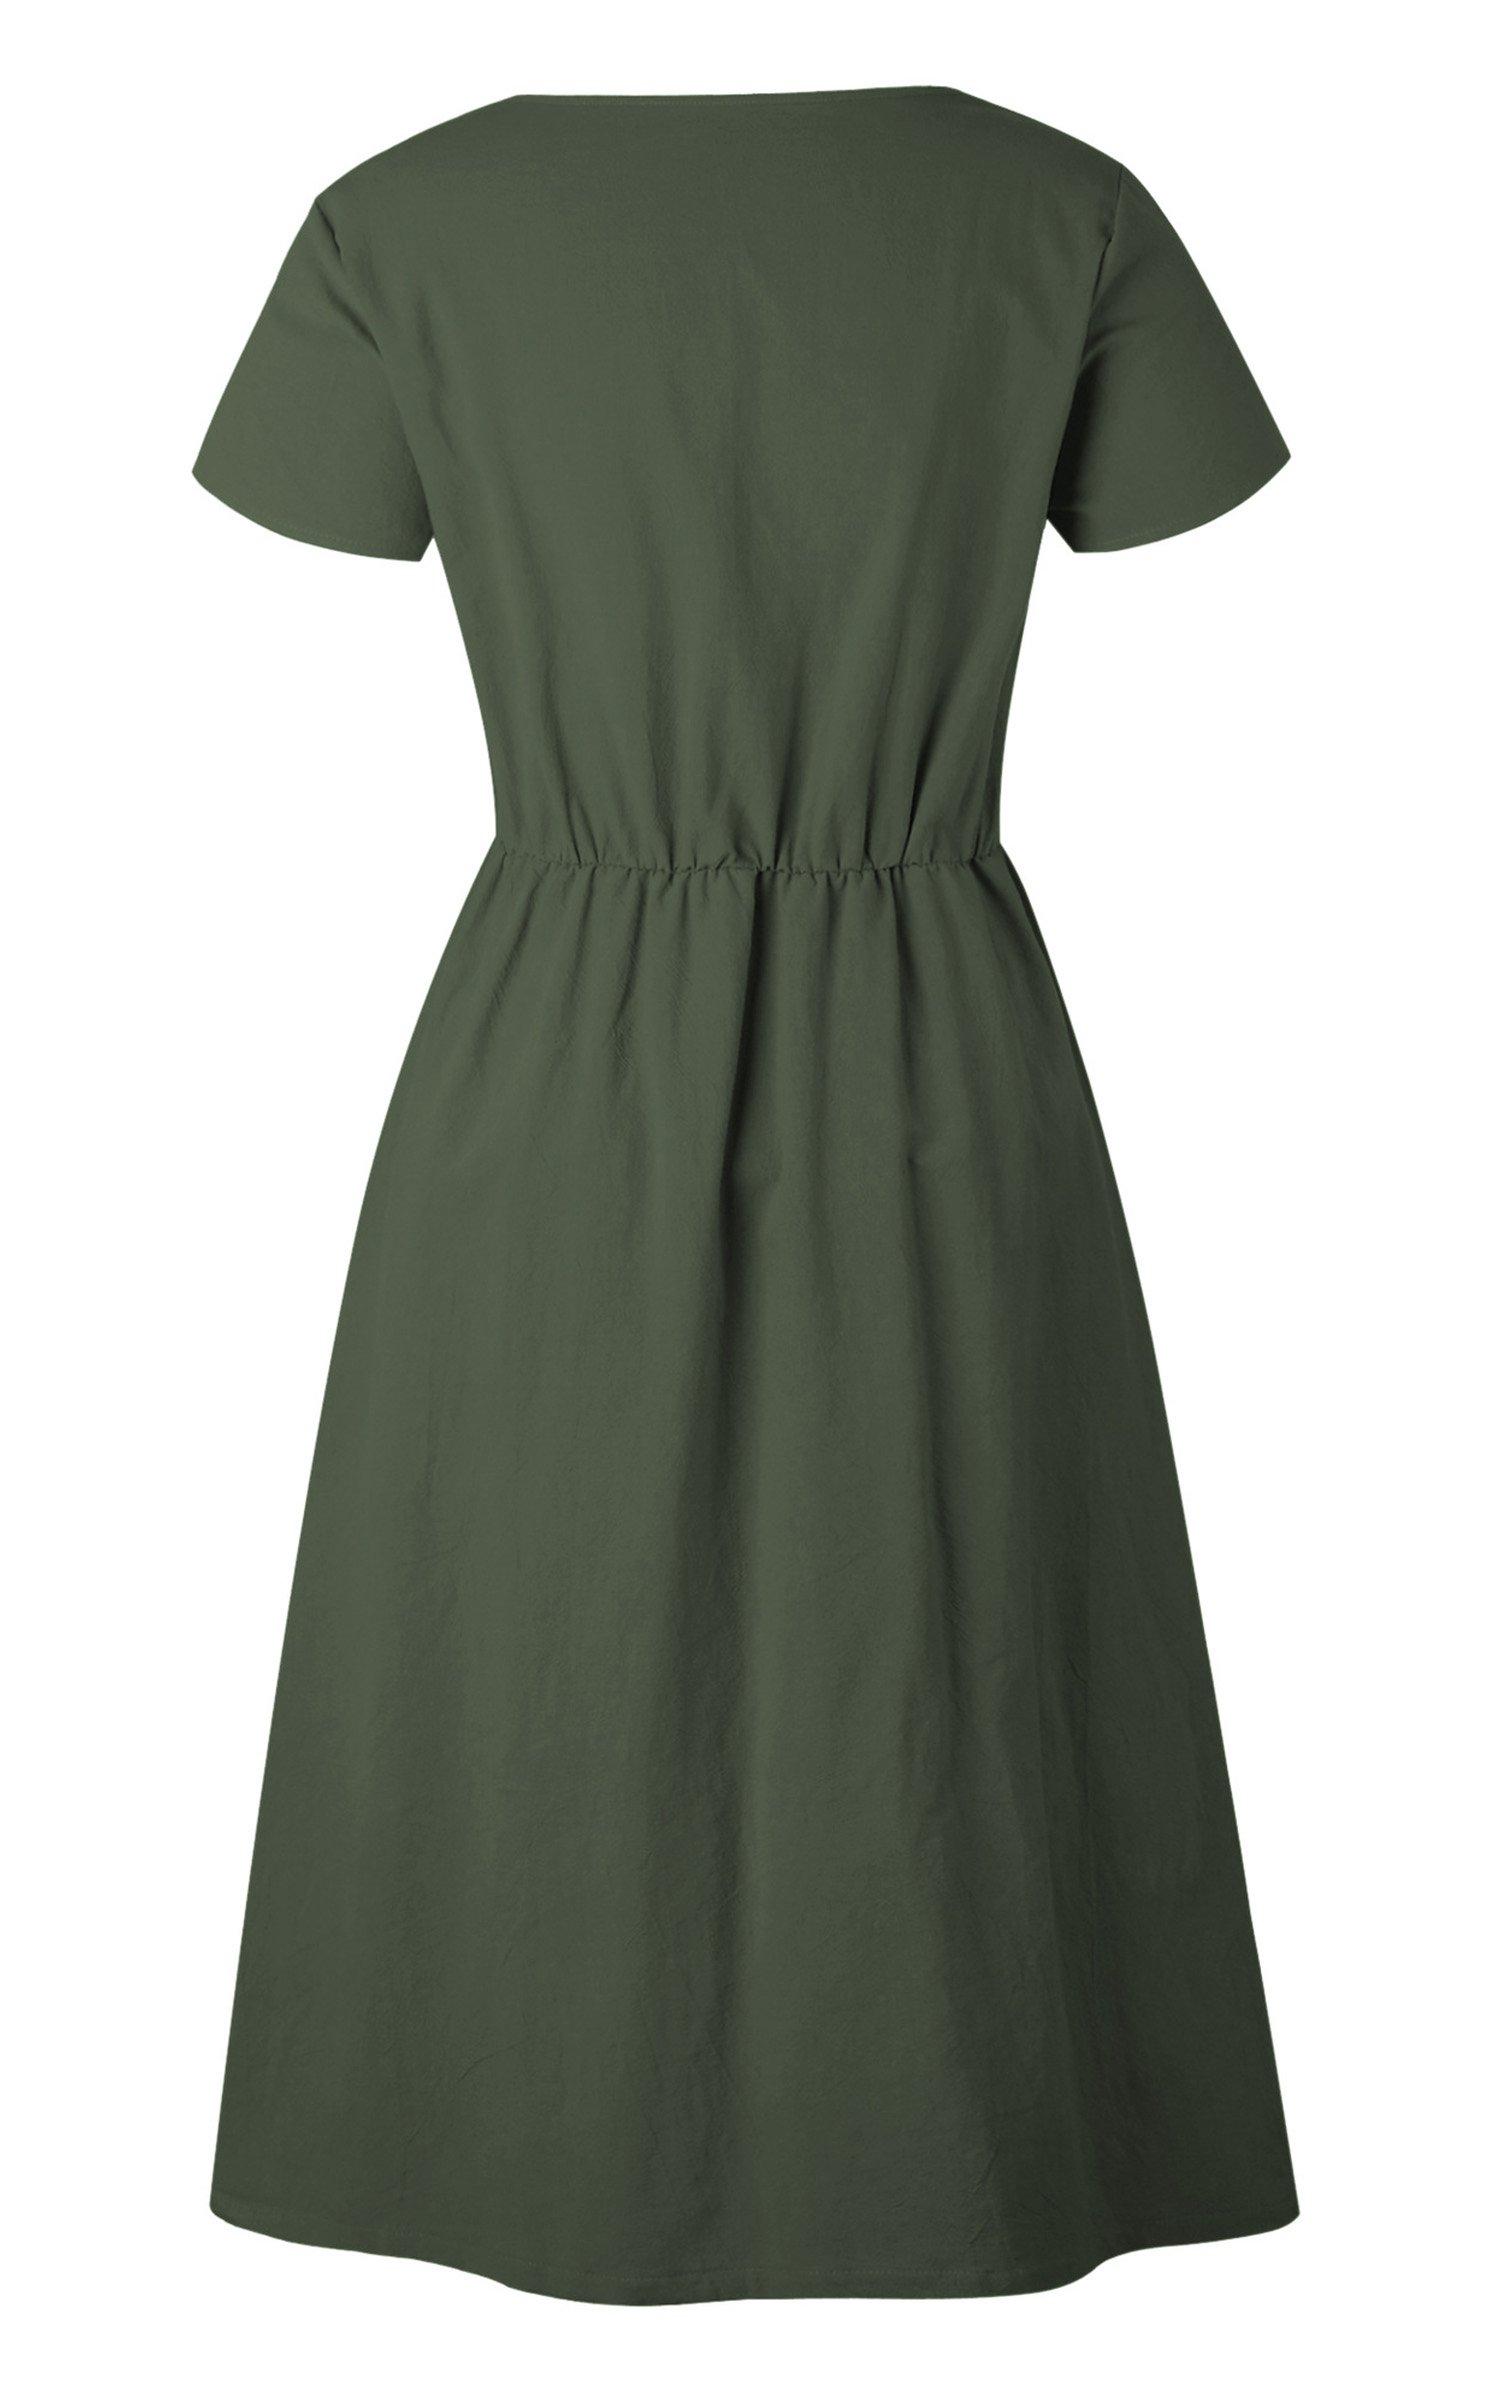 Angashion Women's Dresses-Short Sleeve V Neck Button T Shirt Midi Skater Dress with Pockets by Angashion (Image #6)